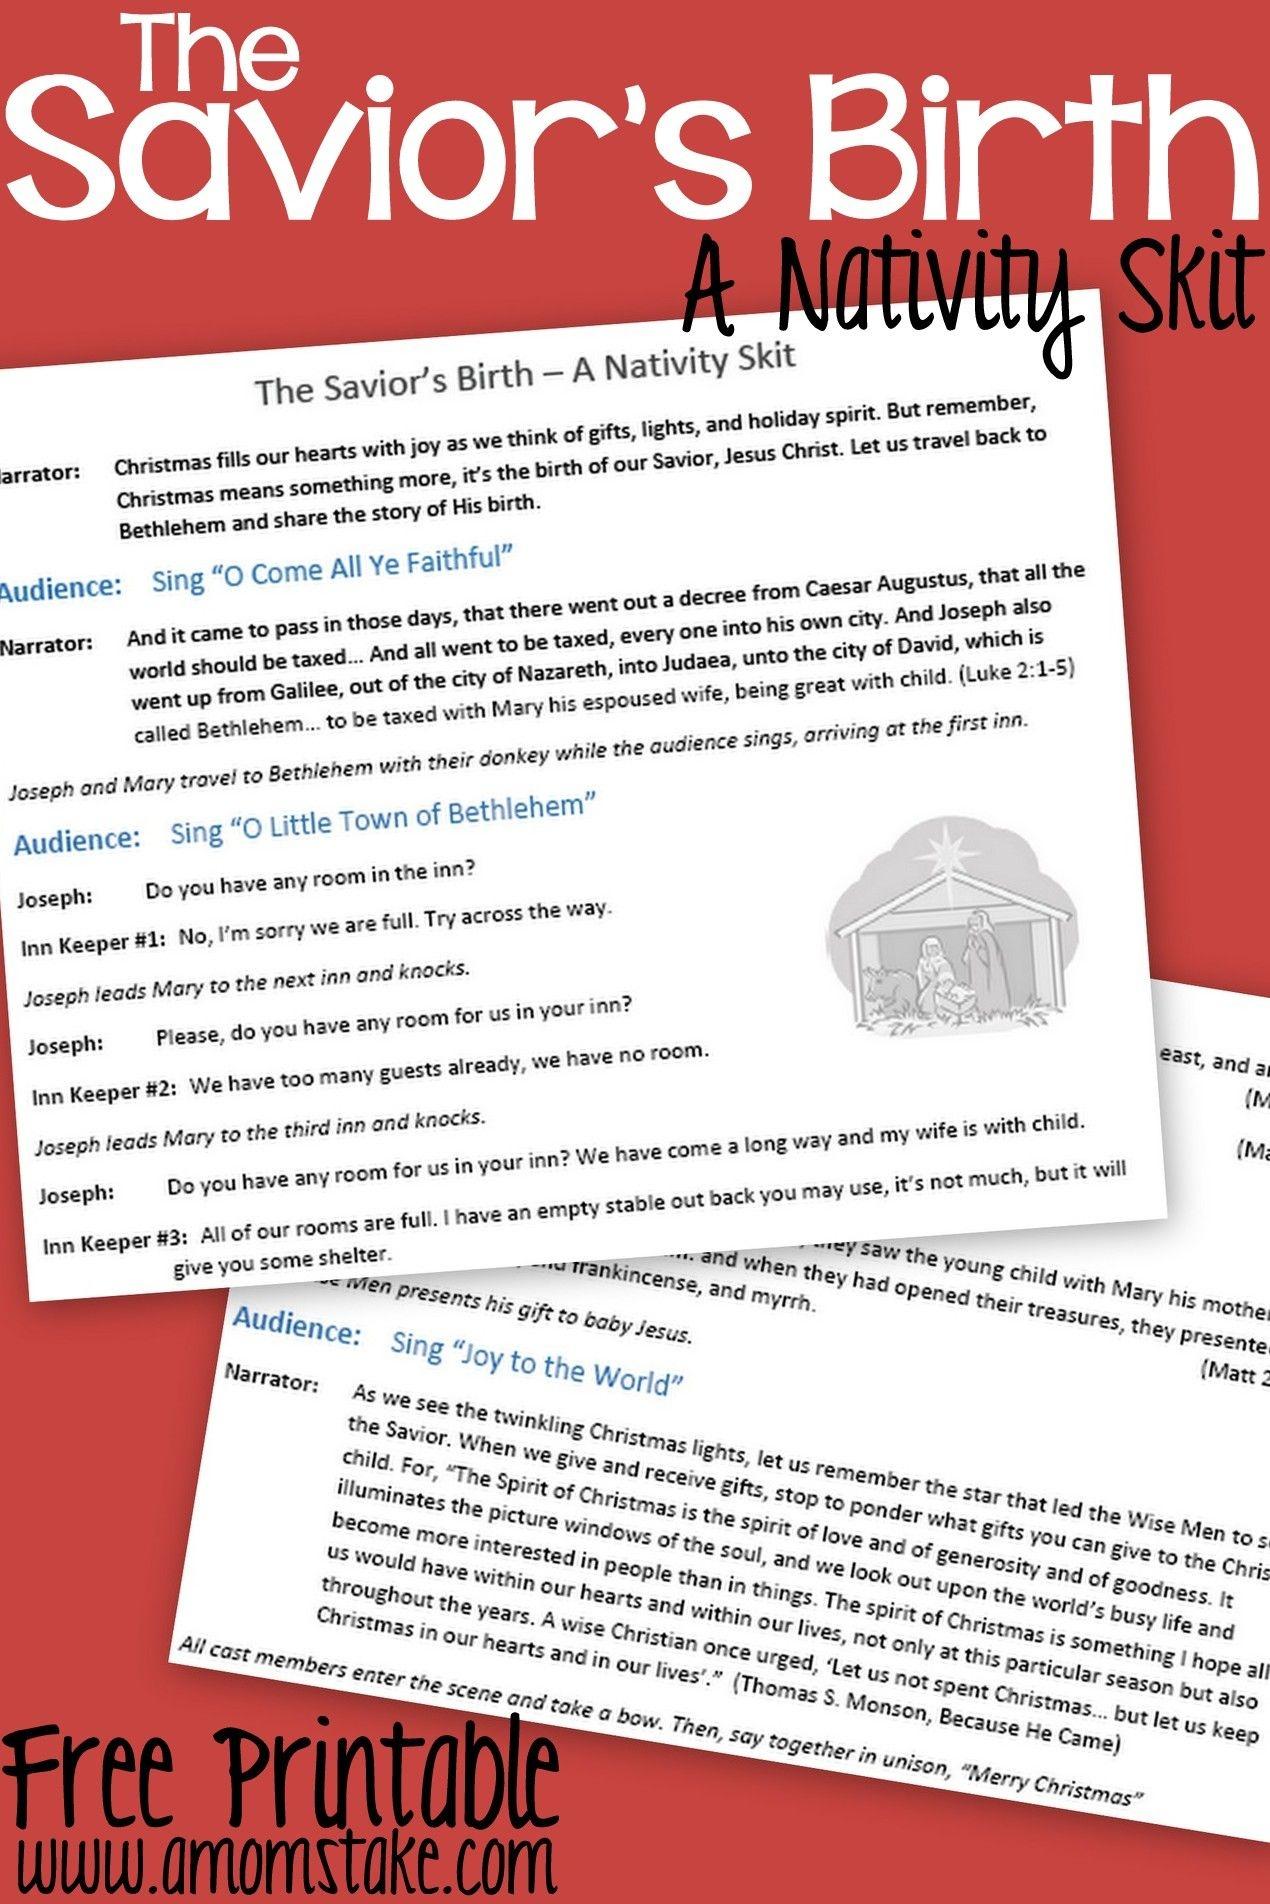 Free Printable Nativity Skit To Act Out The Birth Of The Savior - Free Printable Halloween Play Scripts